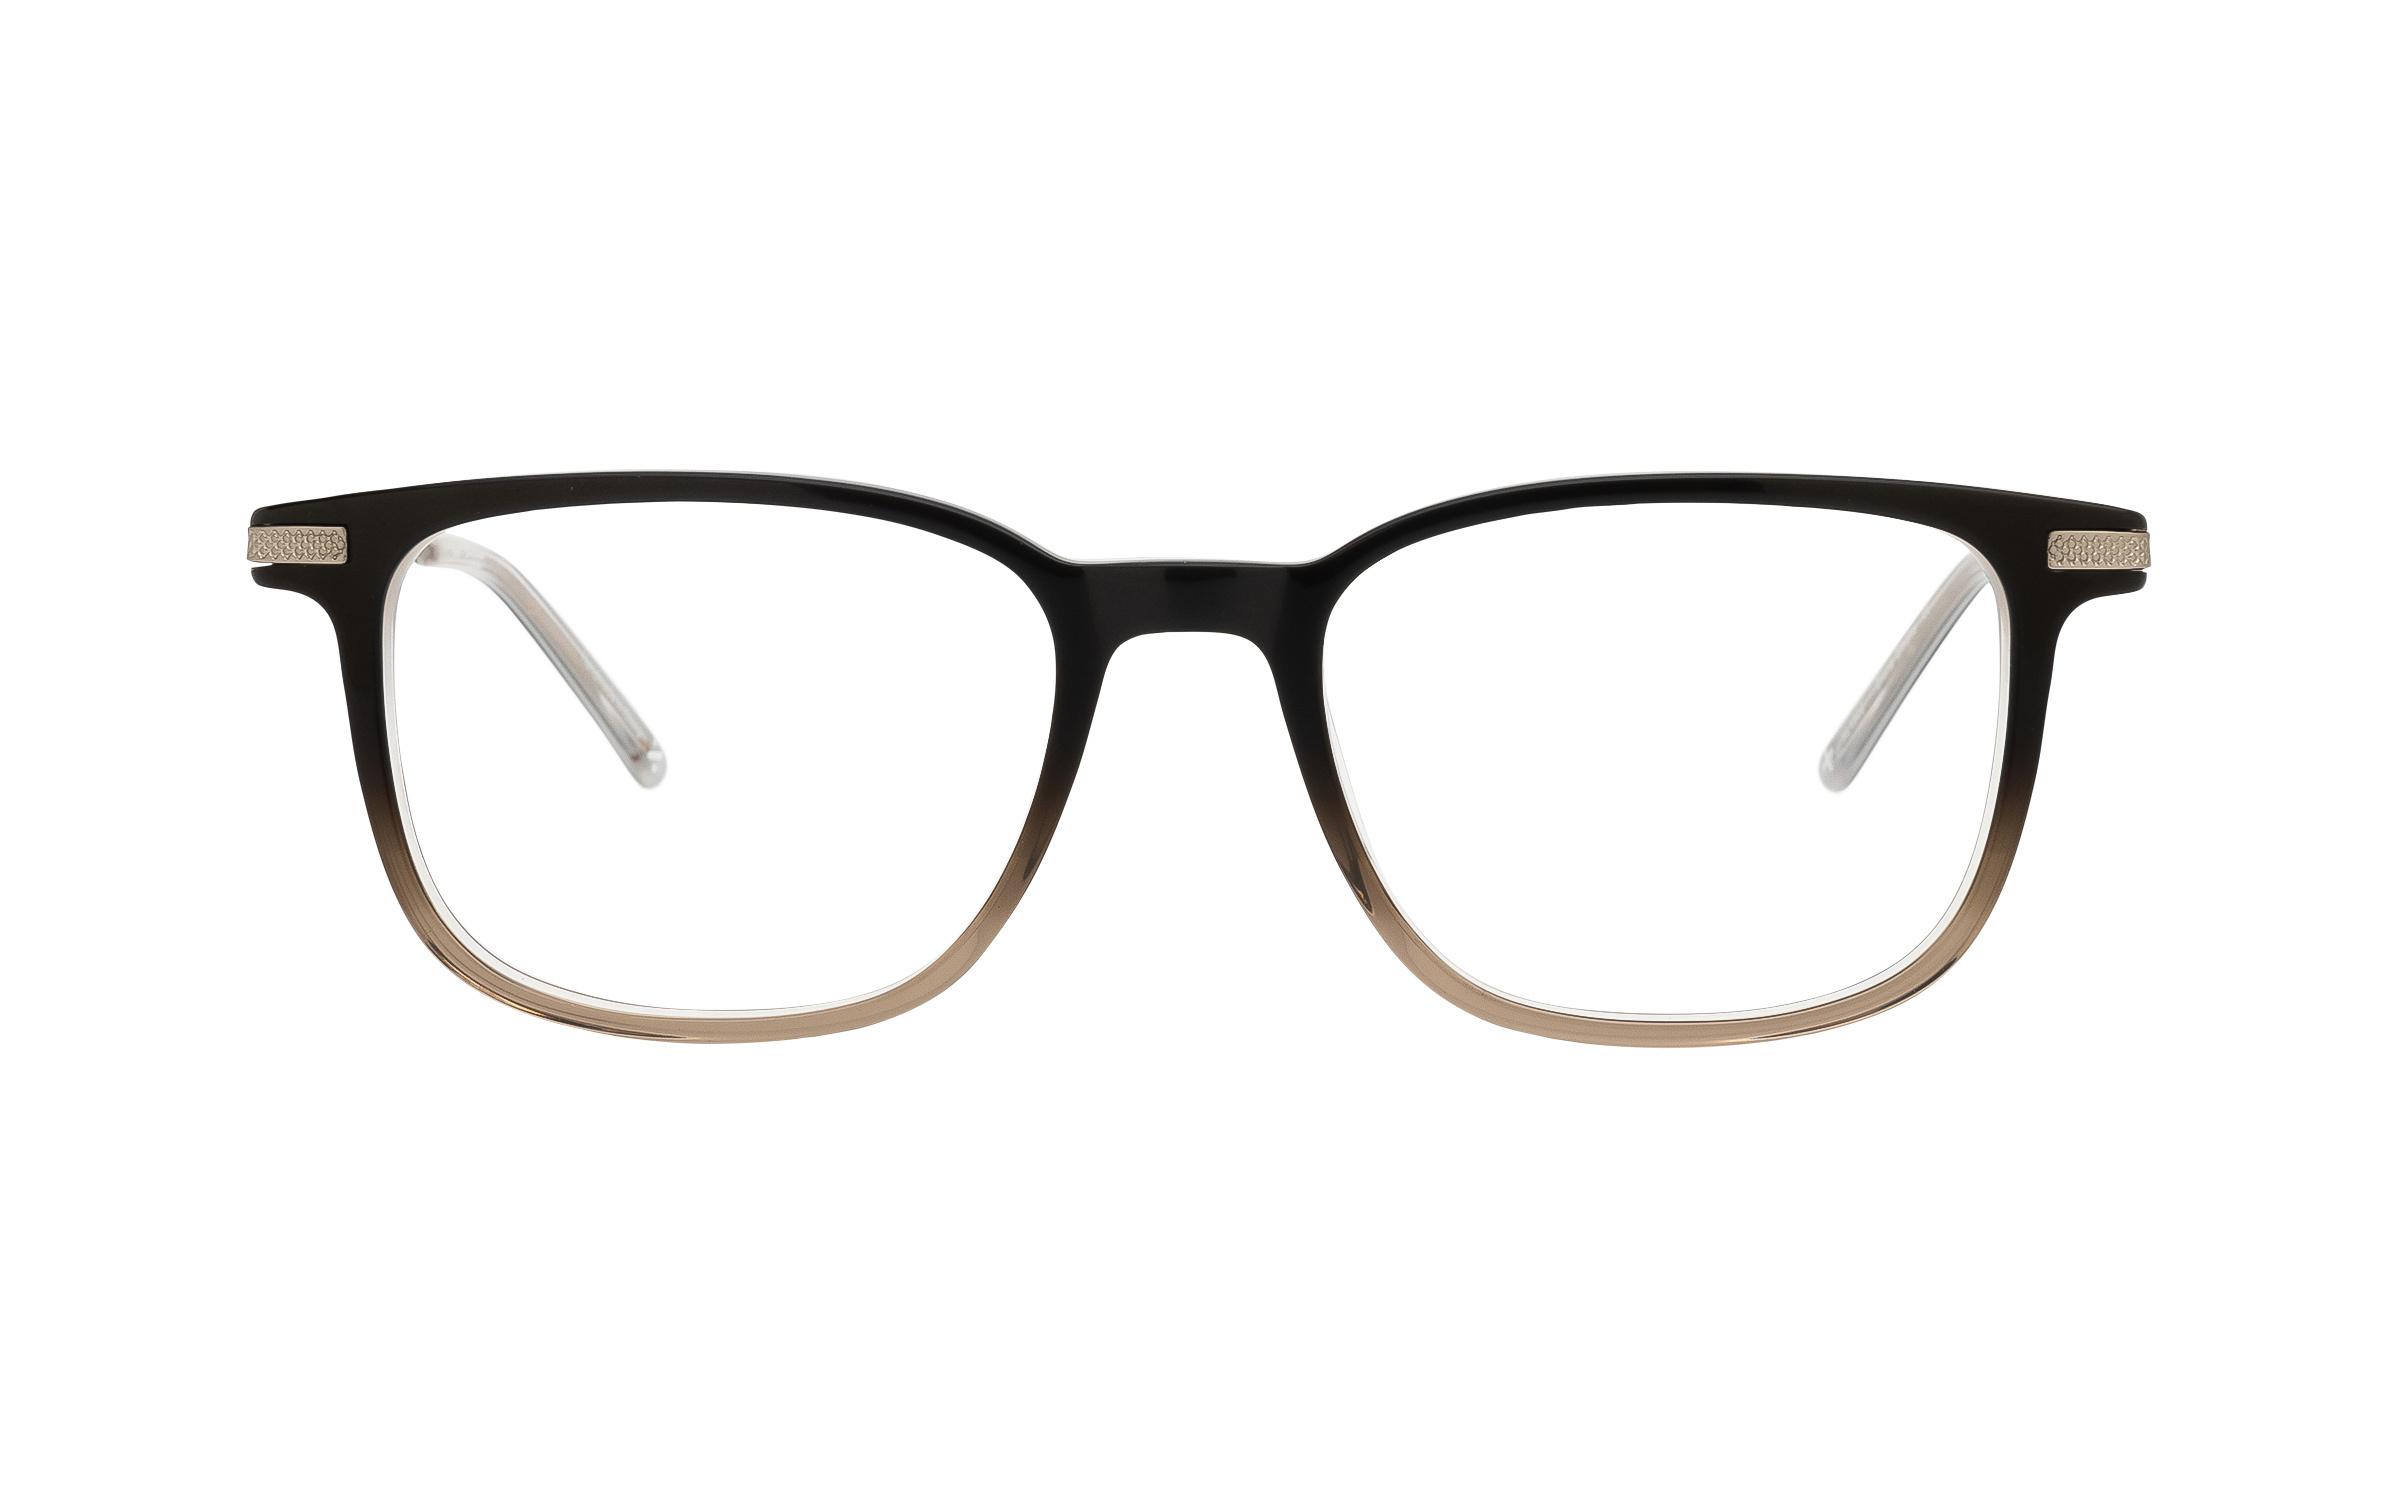 coastal.com - Derek Cardigan Dione (52) Eyeglasses and Frame in Smoke Grey | Acetate/Metal – Online Coastal 55.00 USD